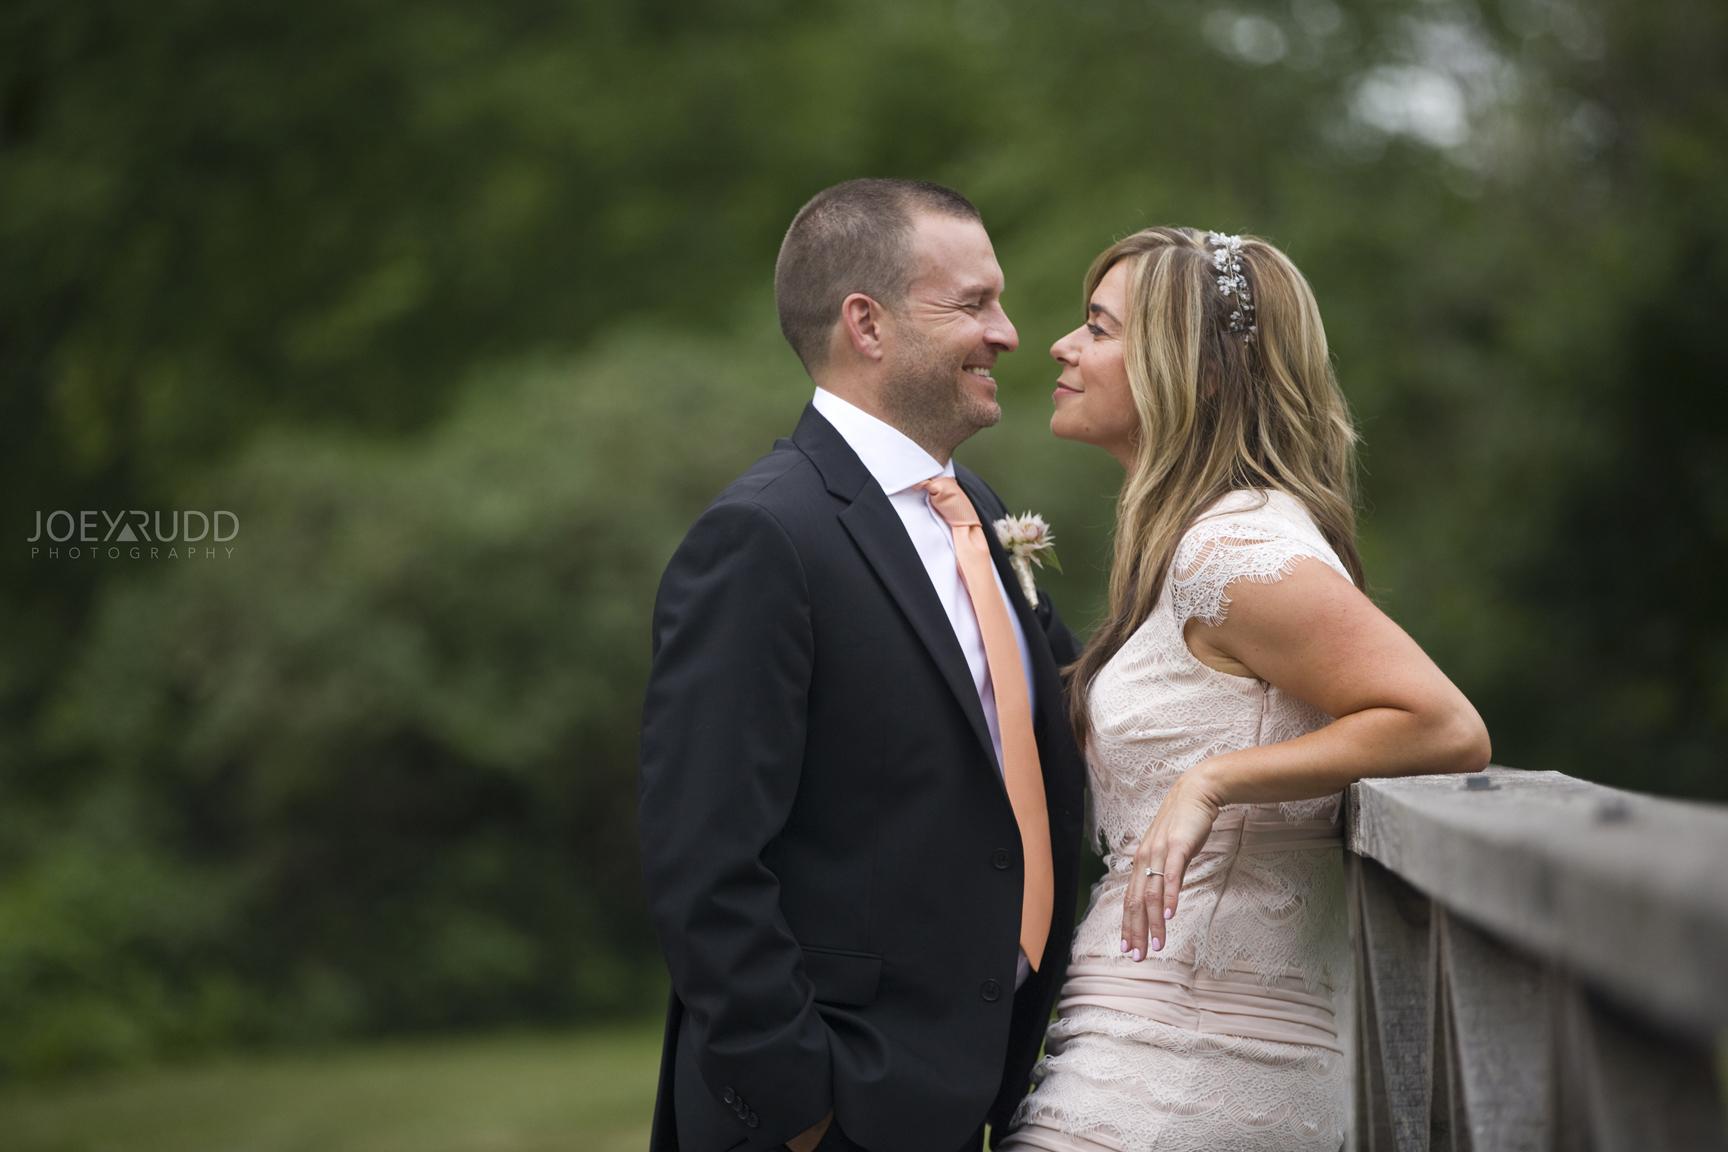 Elopement Wedding by Ottawa Wedding Photographer Joey Rudd Photography Arboretum Bridge Bride and Groom